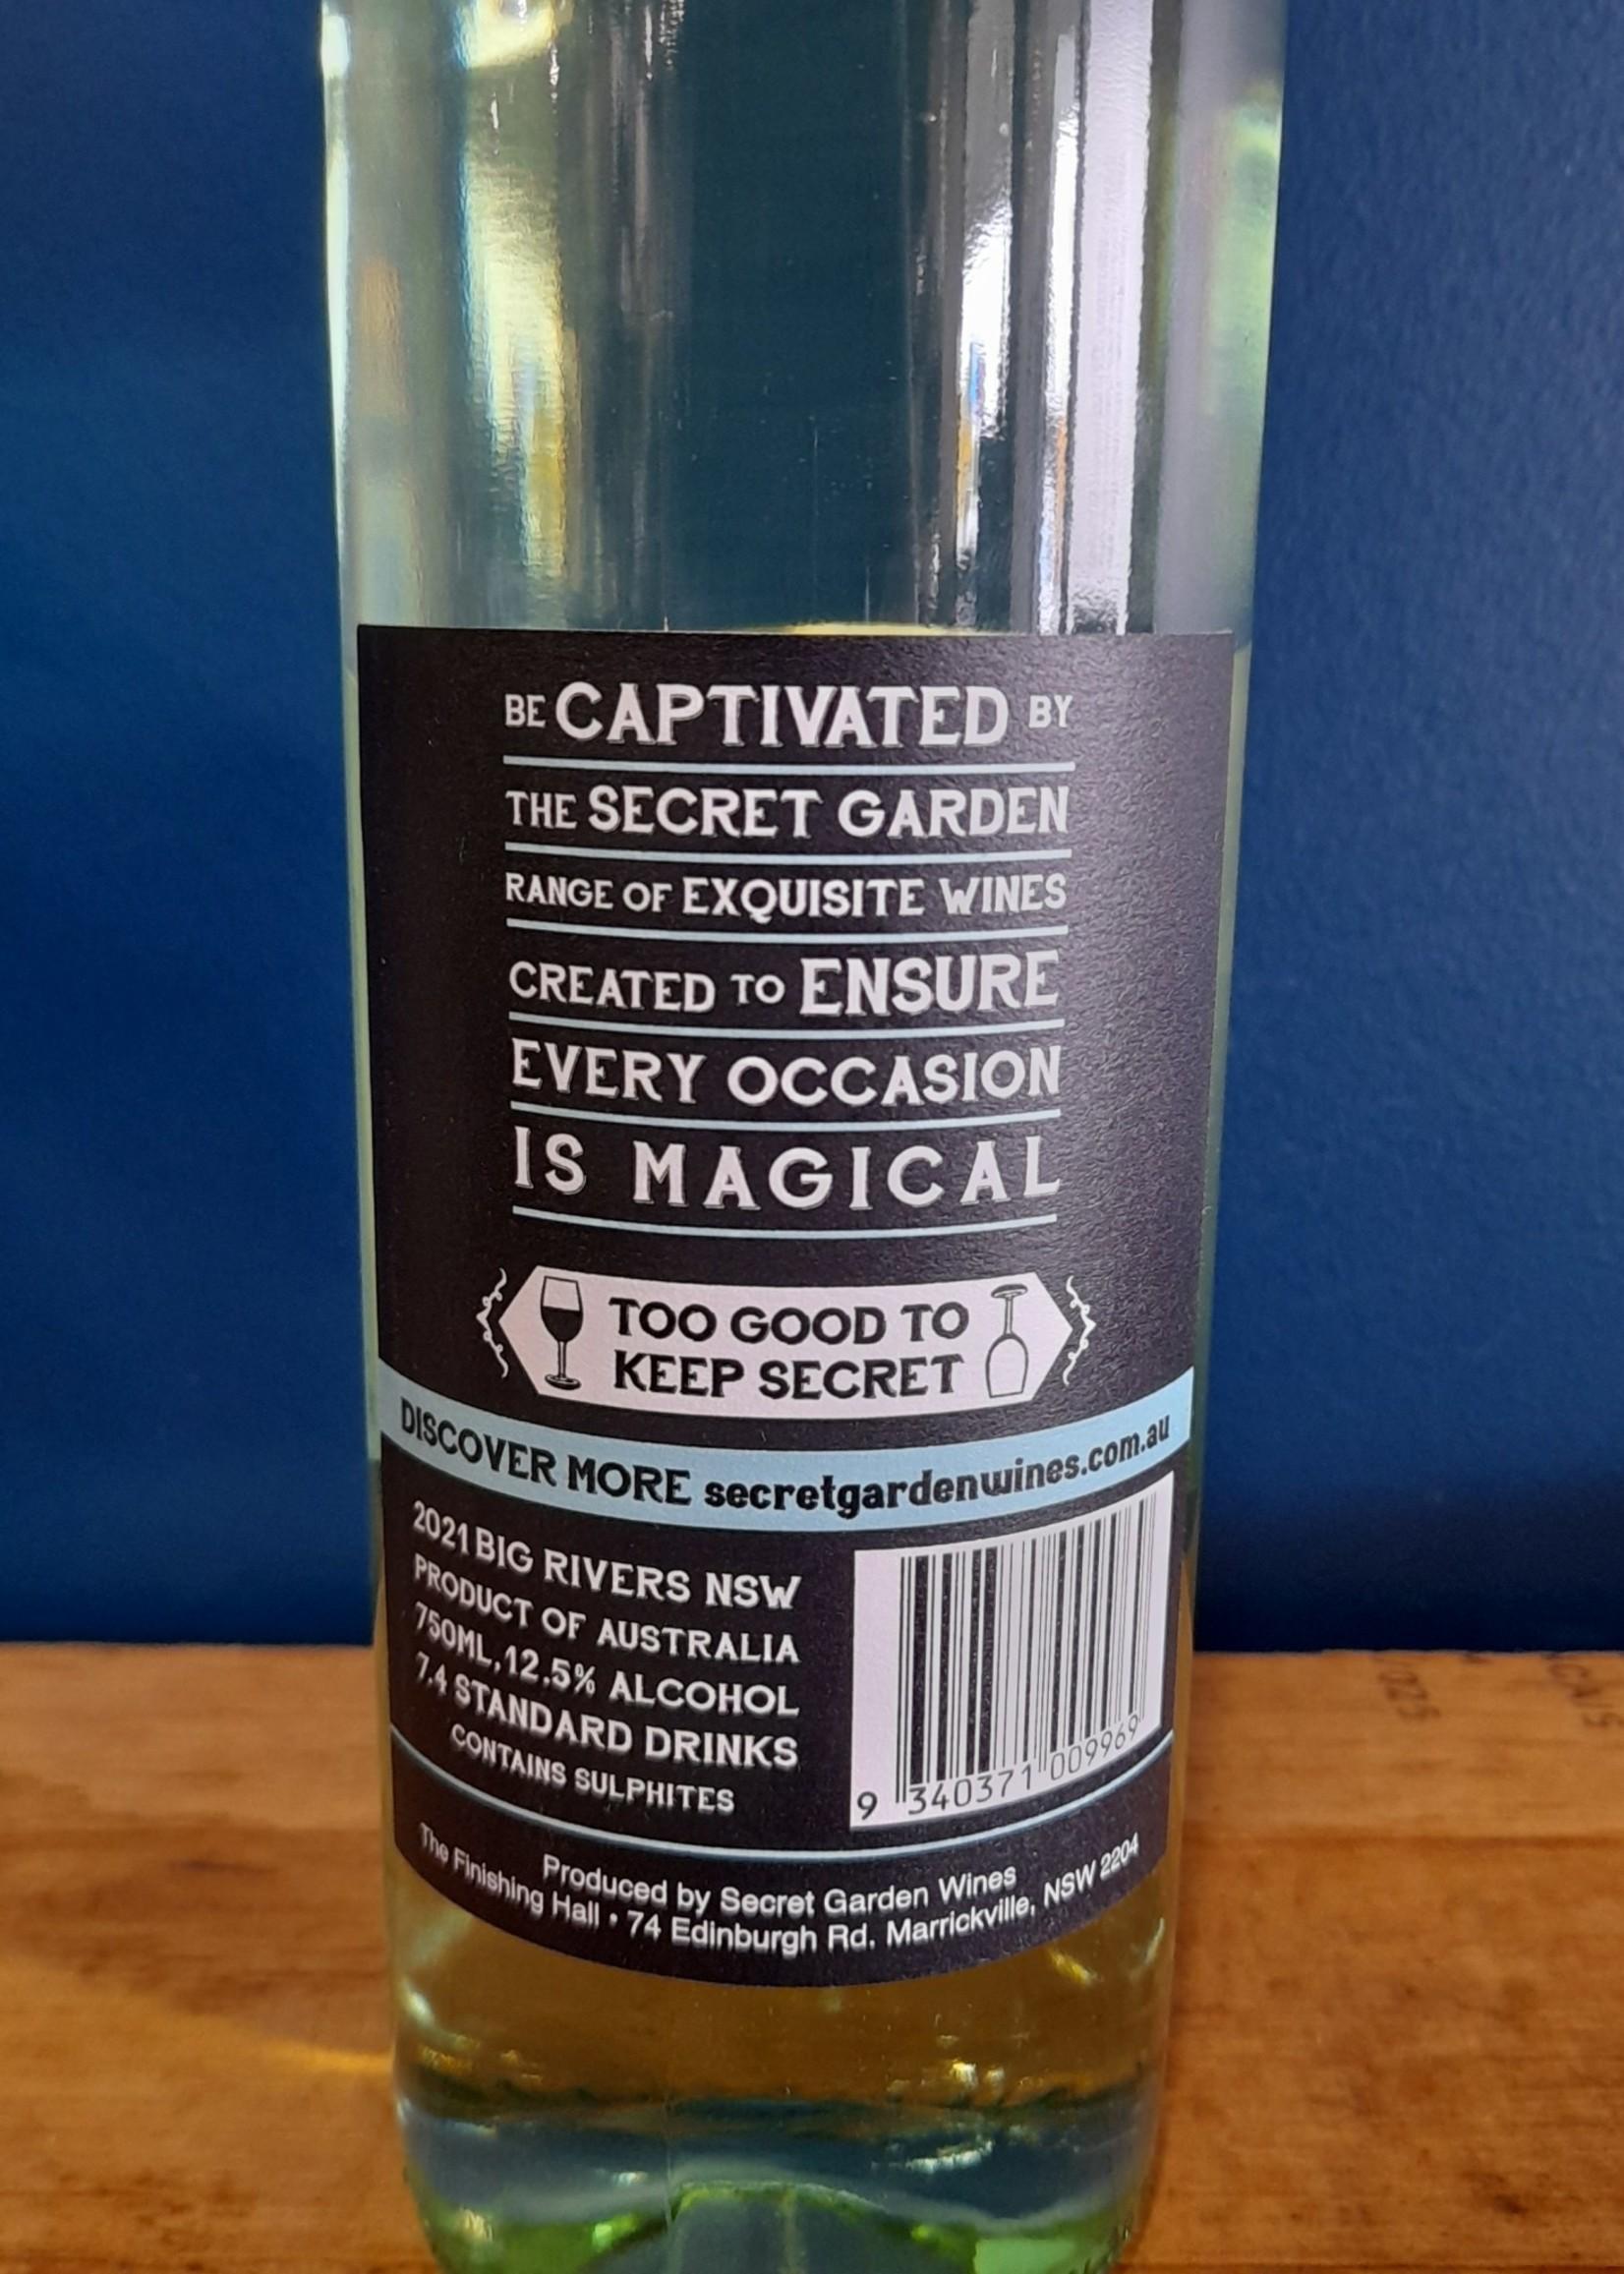 Secret Garden Secret Garden Semillion Sauvignon Blanc 2021